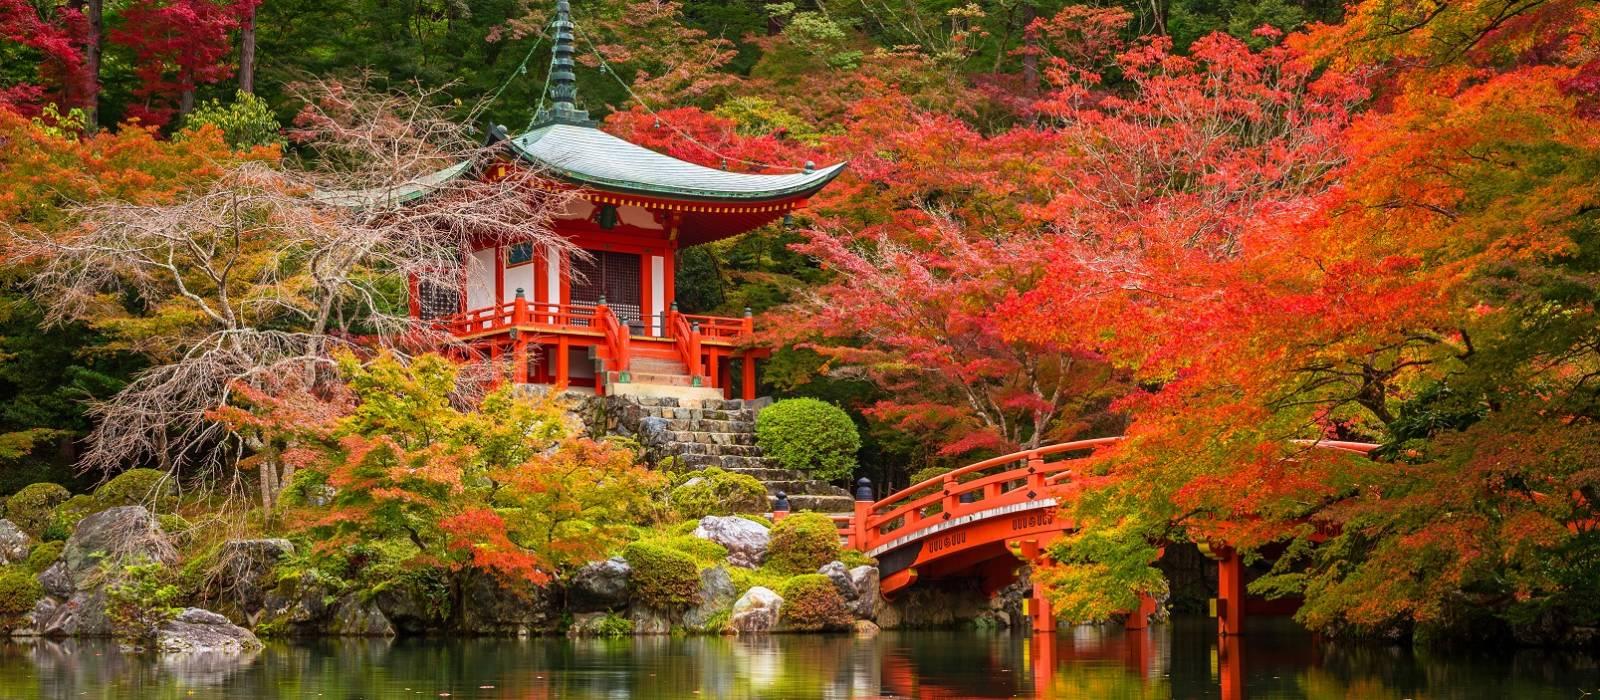 Luxury Japan and Mount Fuji Tour Trip 1